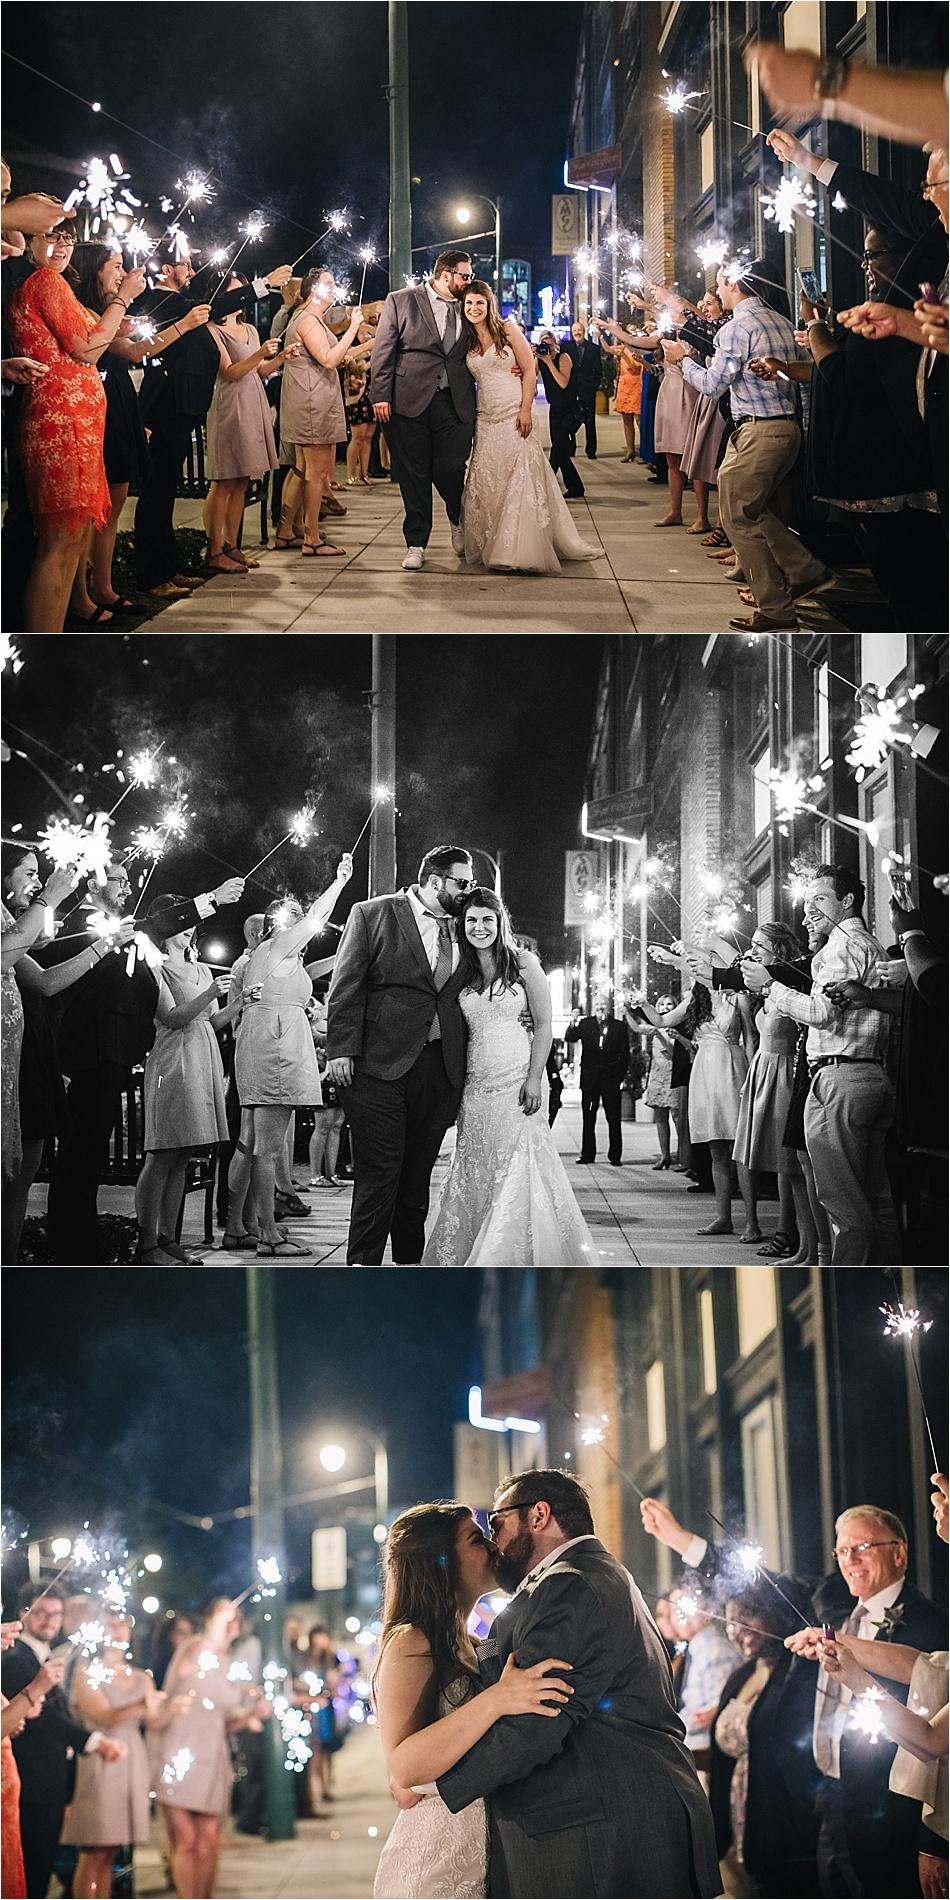 CK-Photo-Nashville-Wedding-Photographer-_0036.jpg